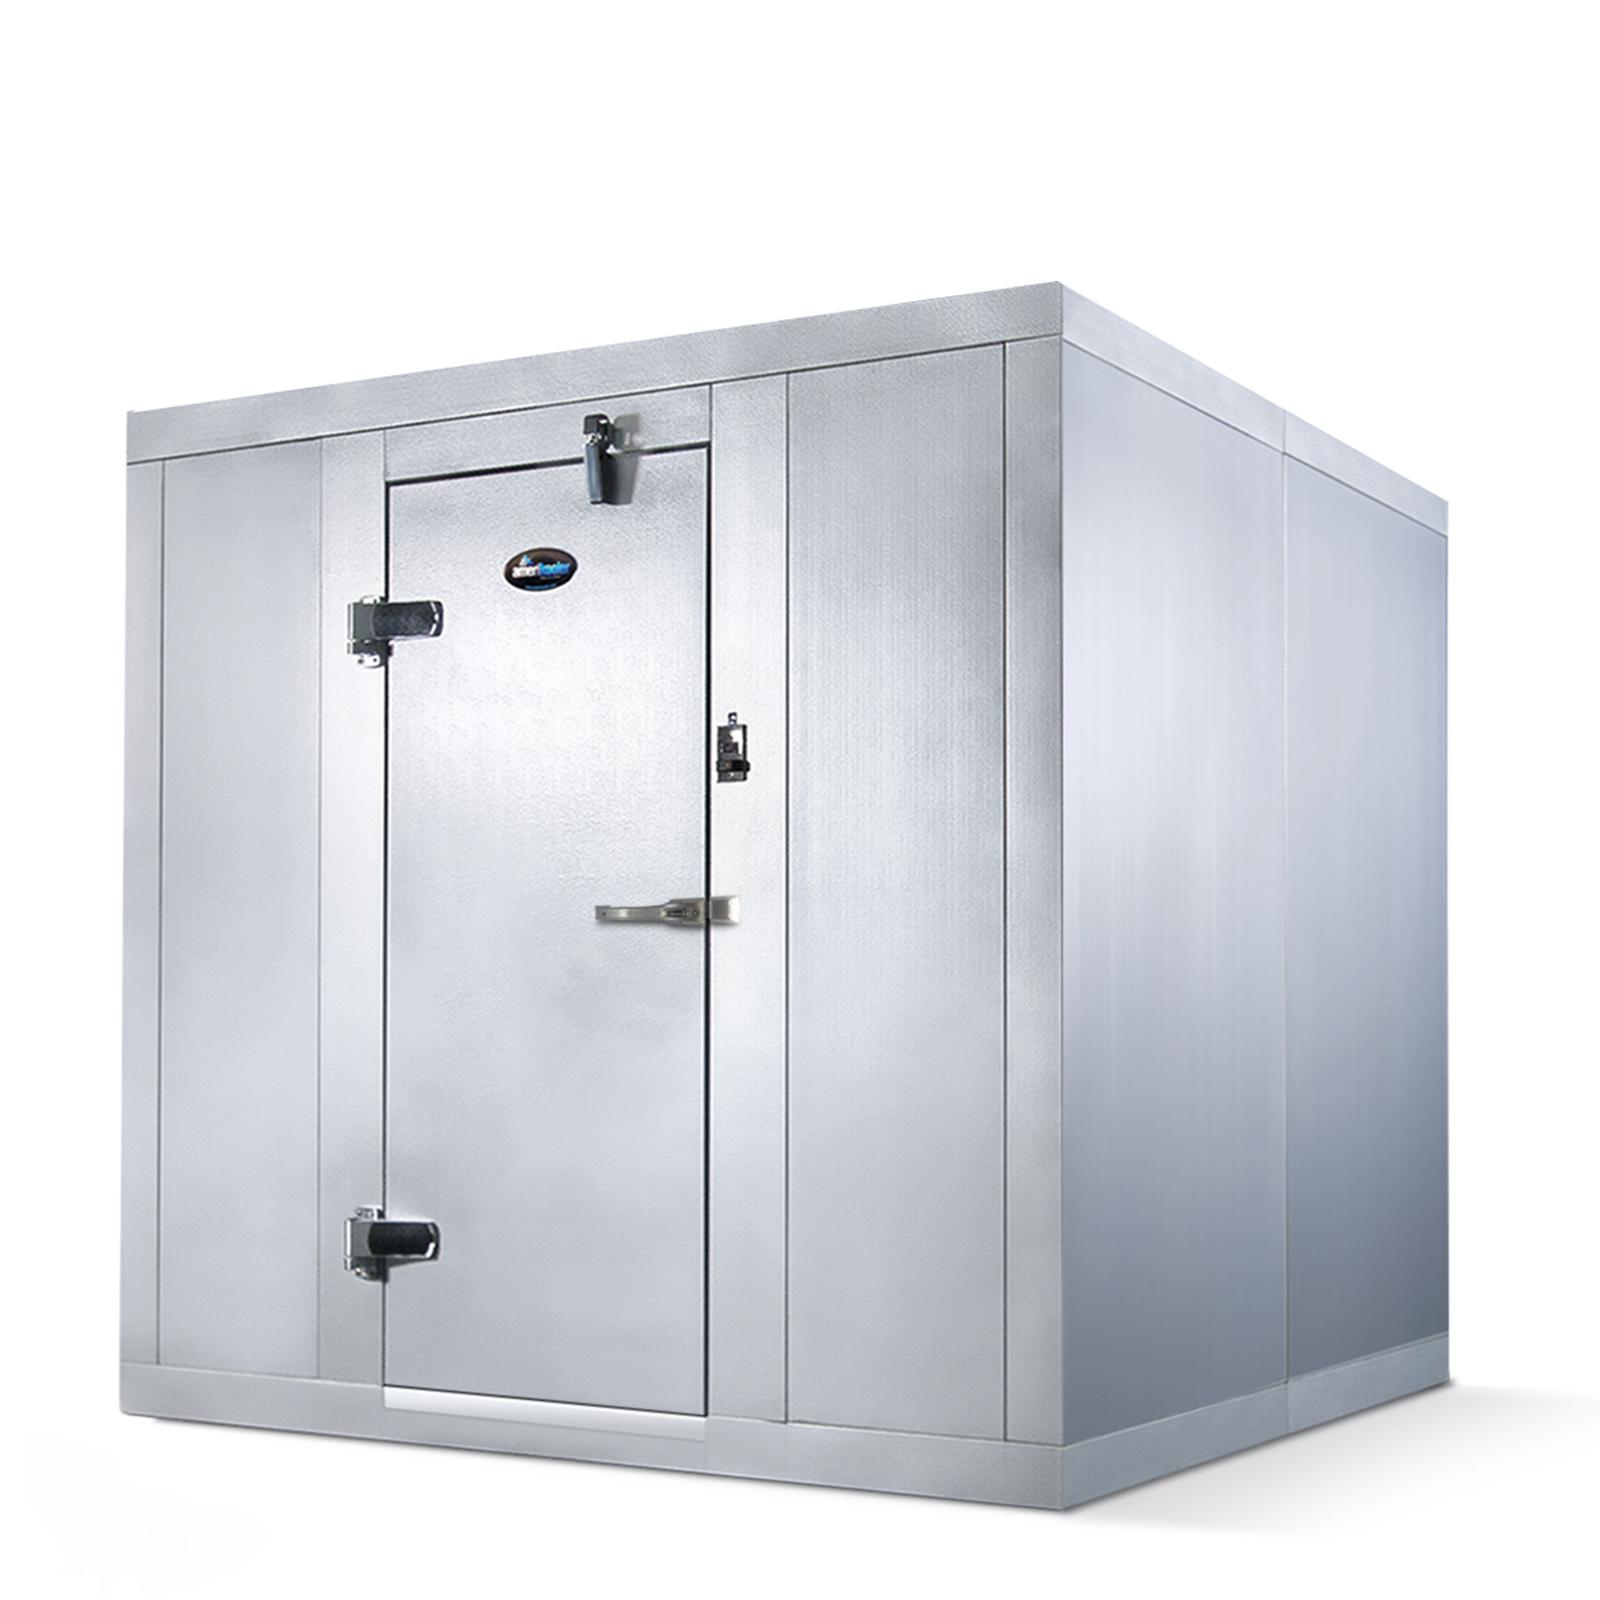 AmeriKooler QF060677**FBRM-O walk in freezer, modular, remote